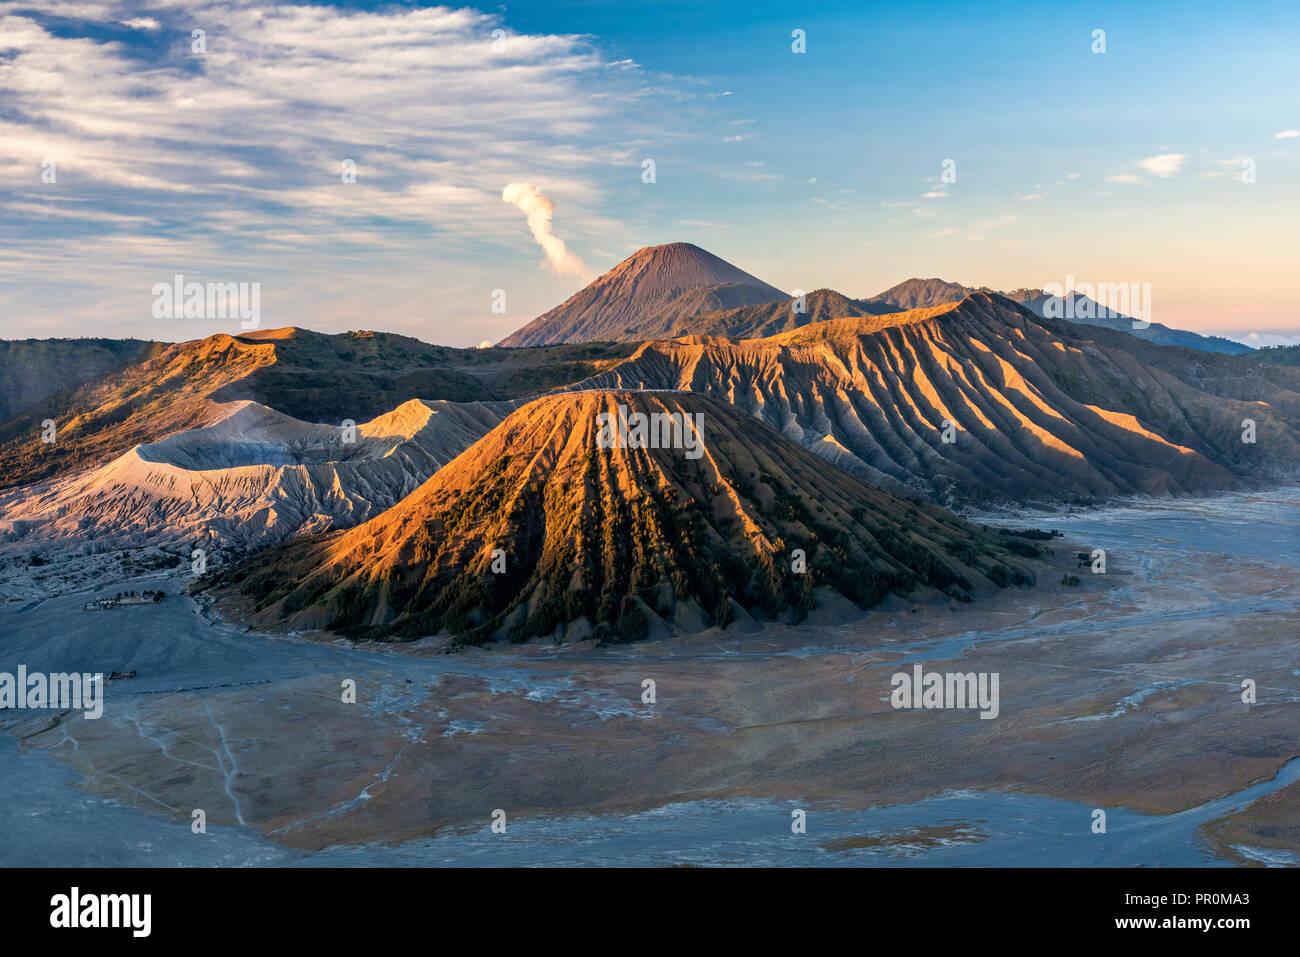 Mountains Bromo, Semeru, Batok and Widodaren, Bromo Tengger Semeru National Park, Java, Indonesia - Stock Image